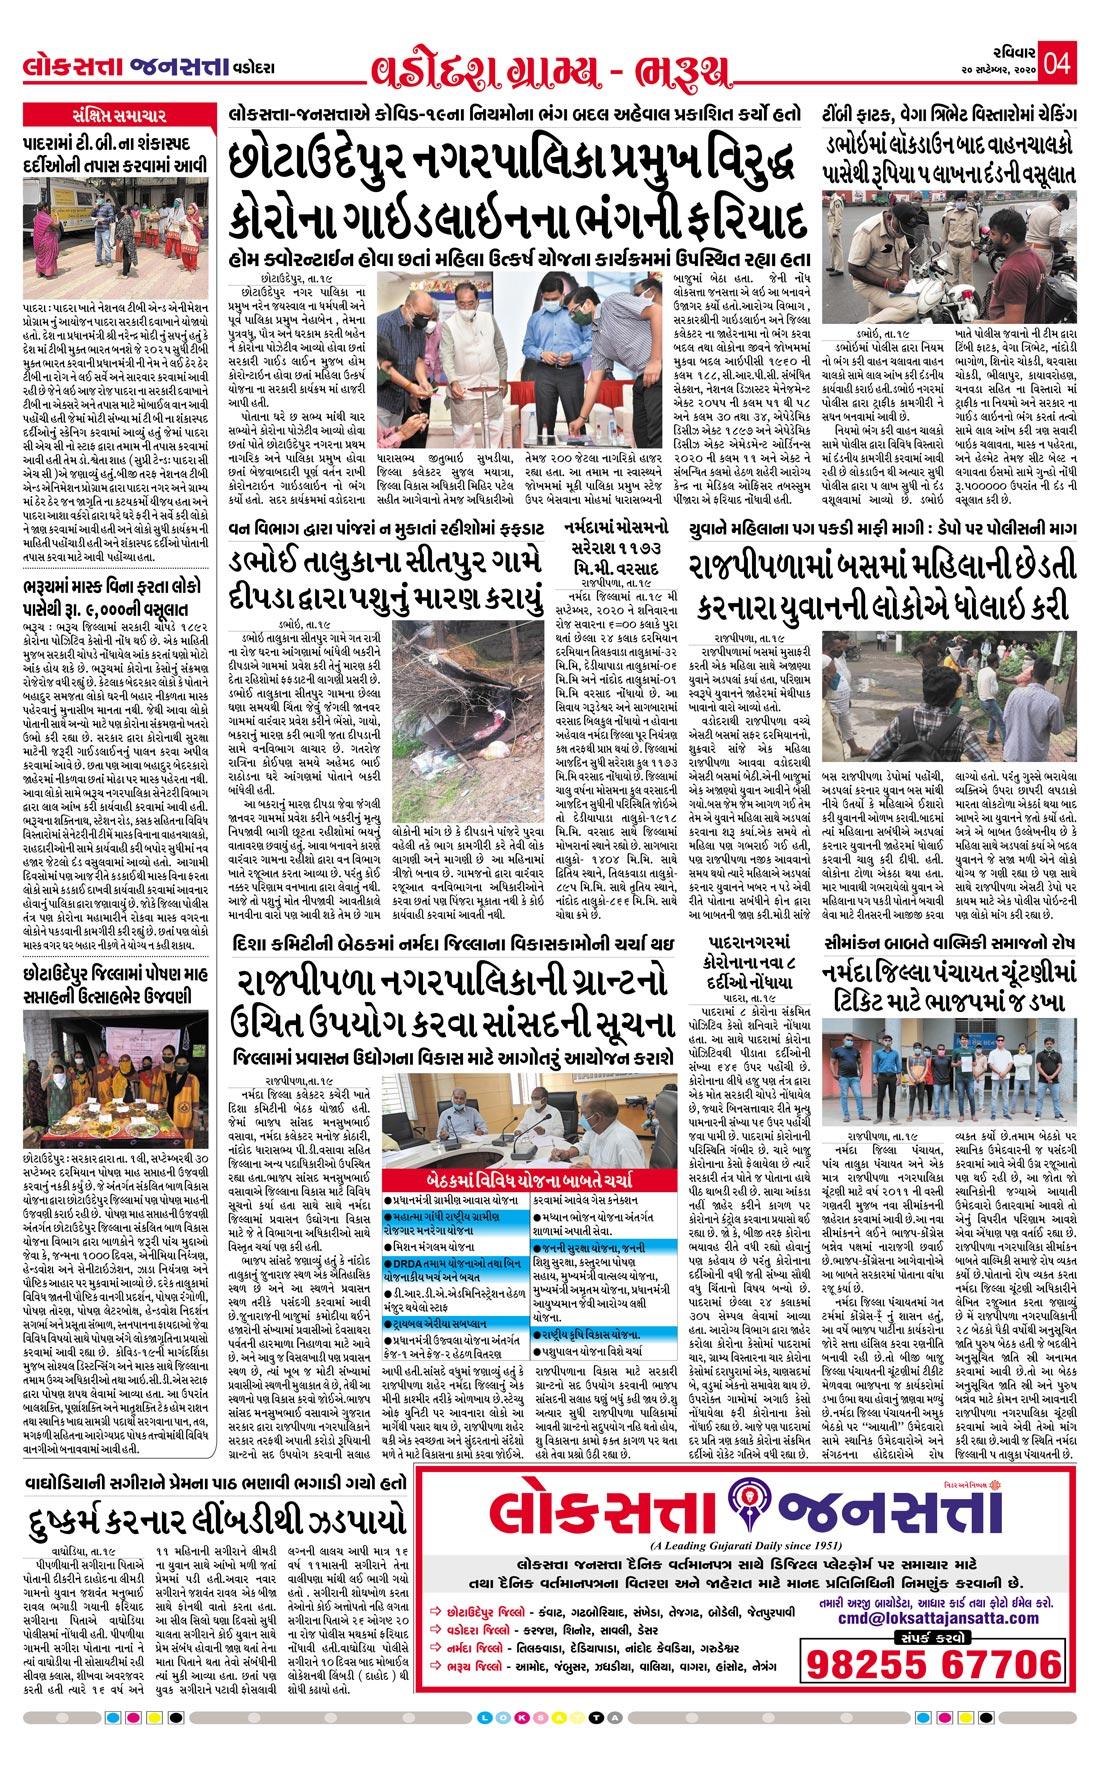 Loksatta Jansatta News Papaer E-paper dated 2020-09-20   Page 4